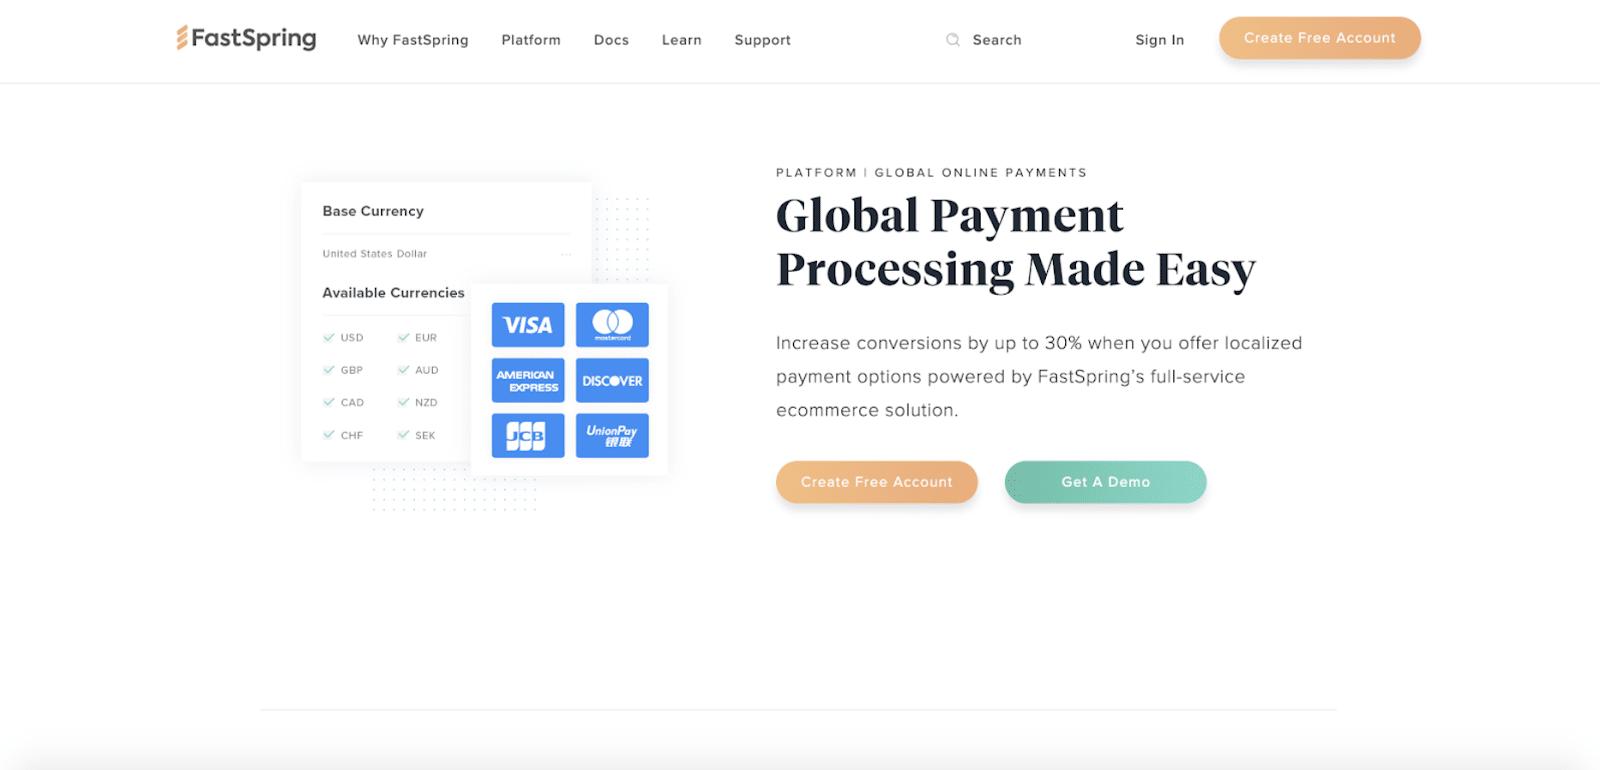 PayPal Alternative FastSpring